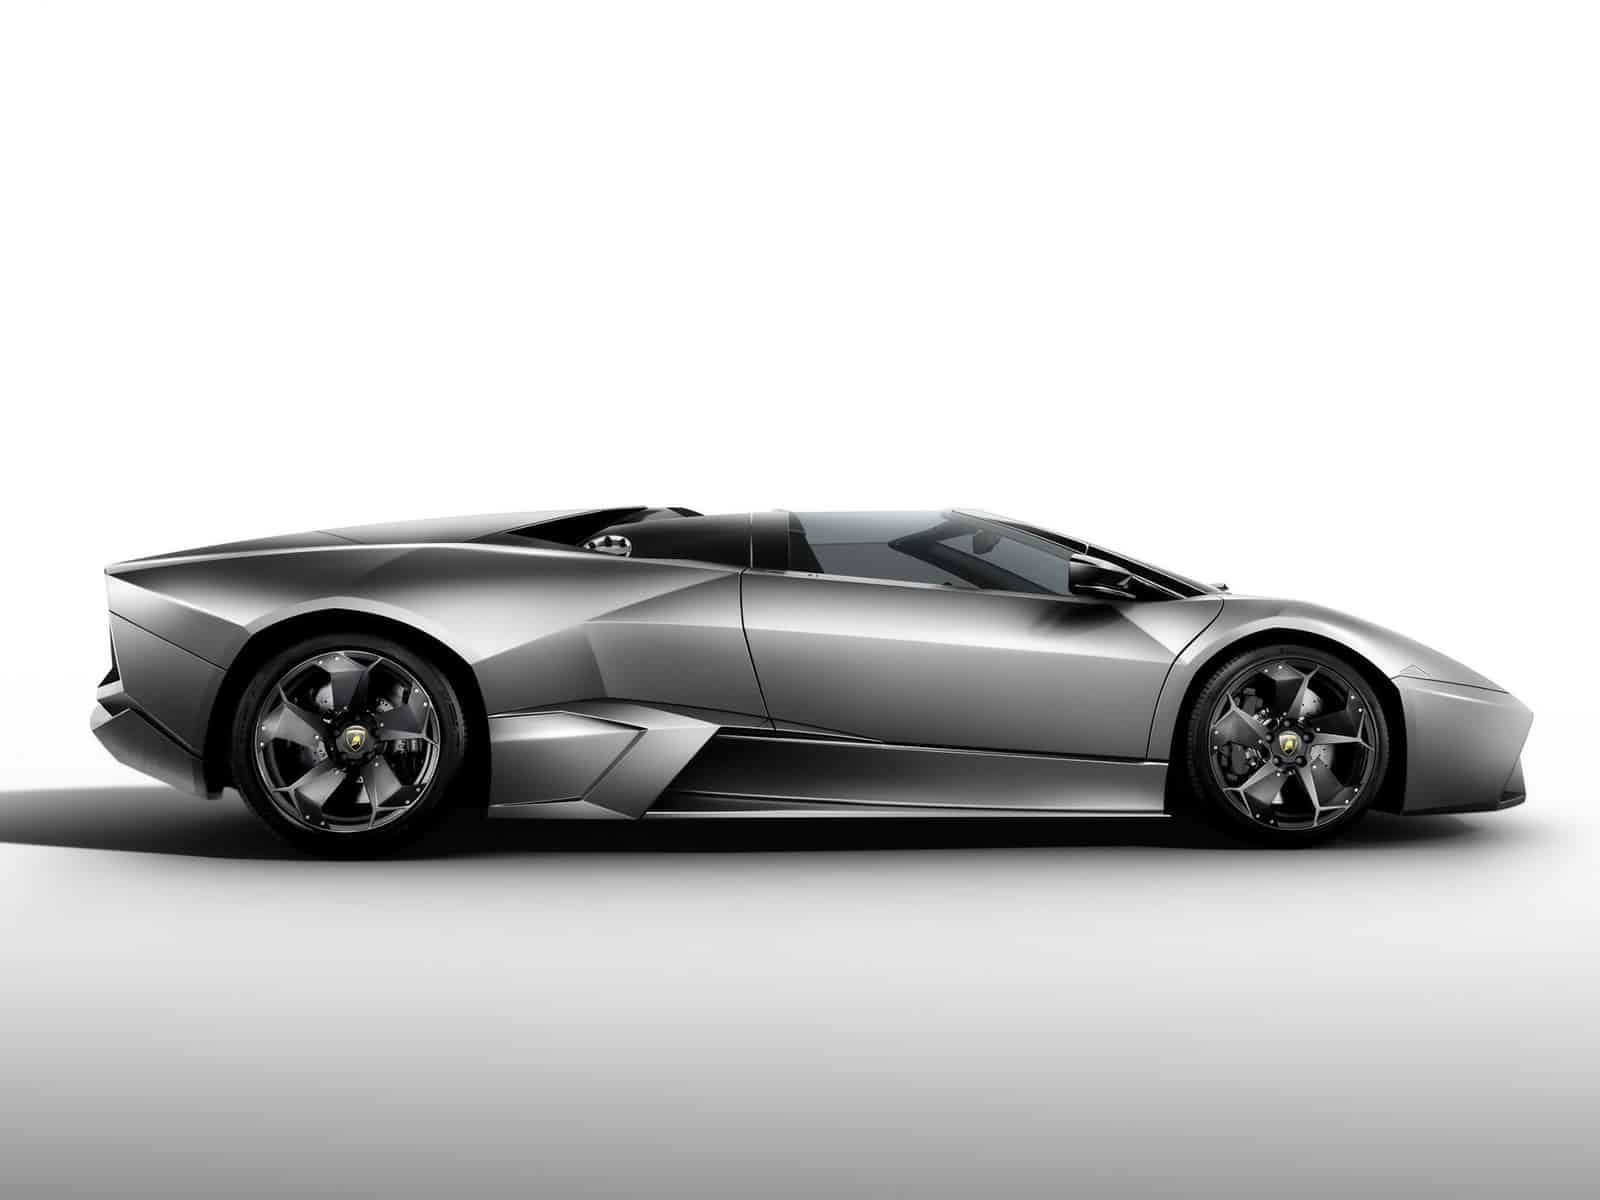 Lamborghini Reventón Roadster by elabia.de